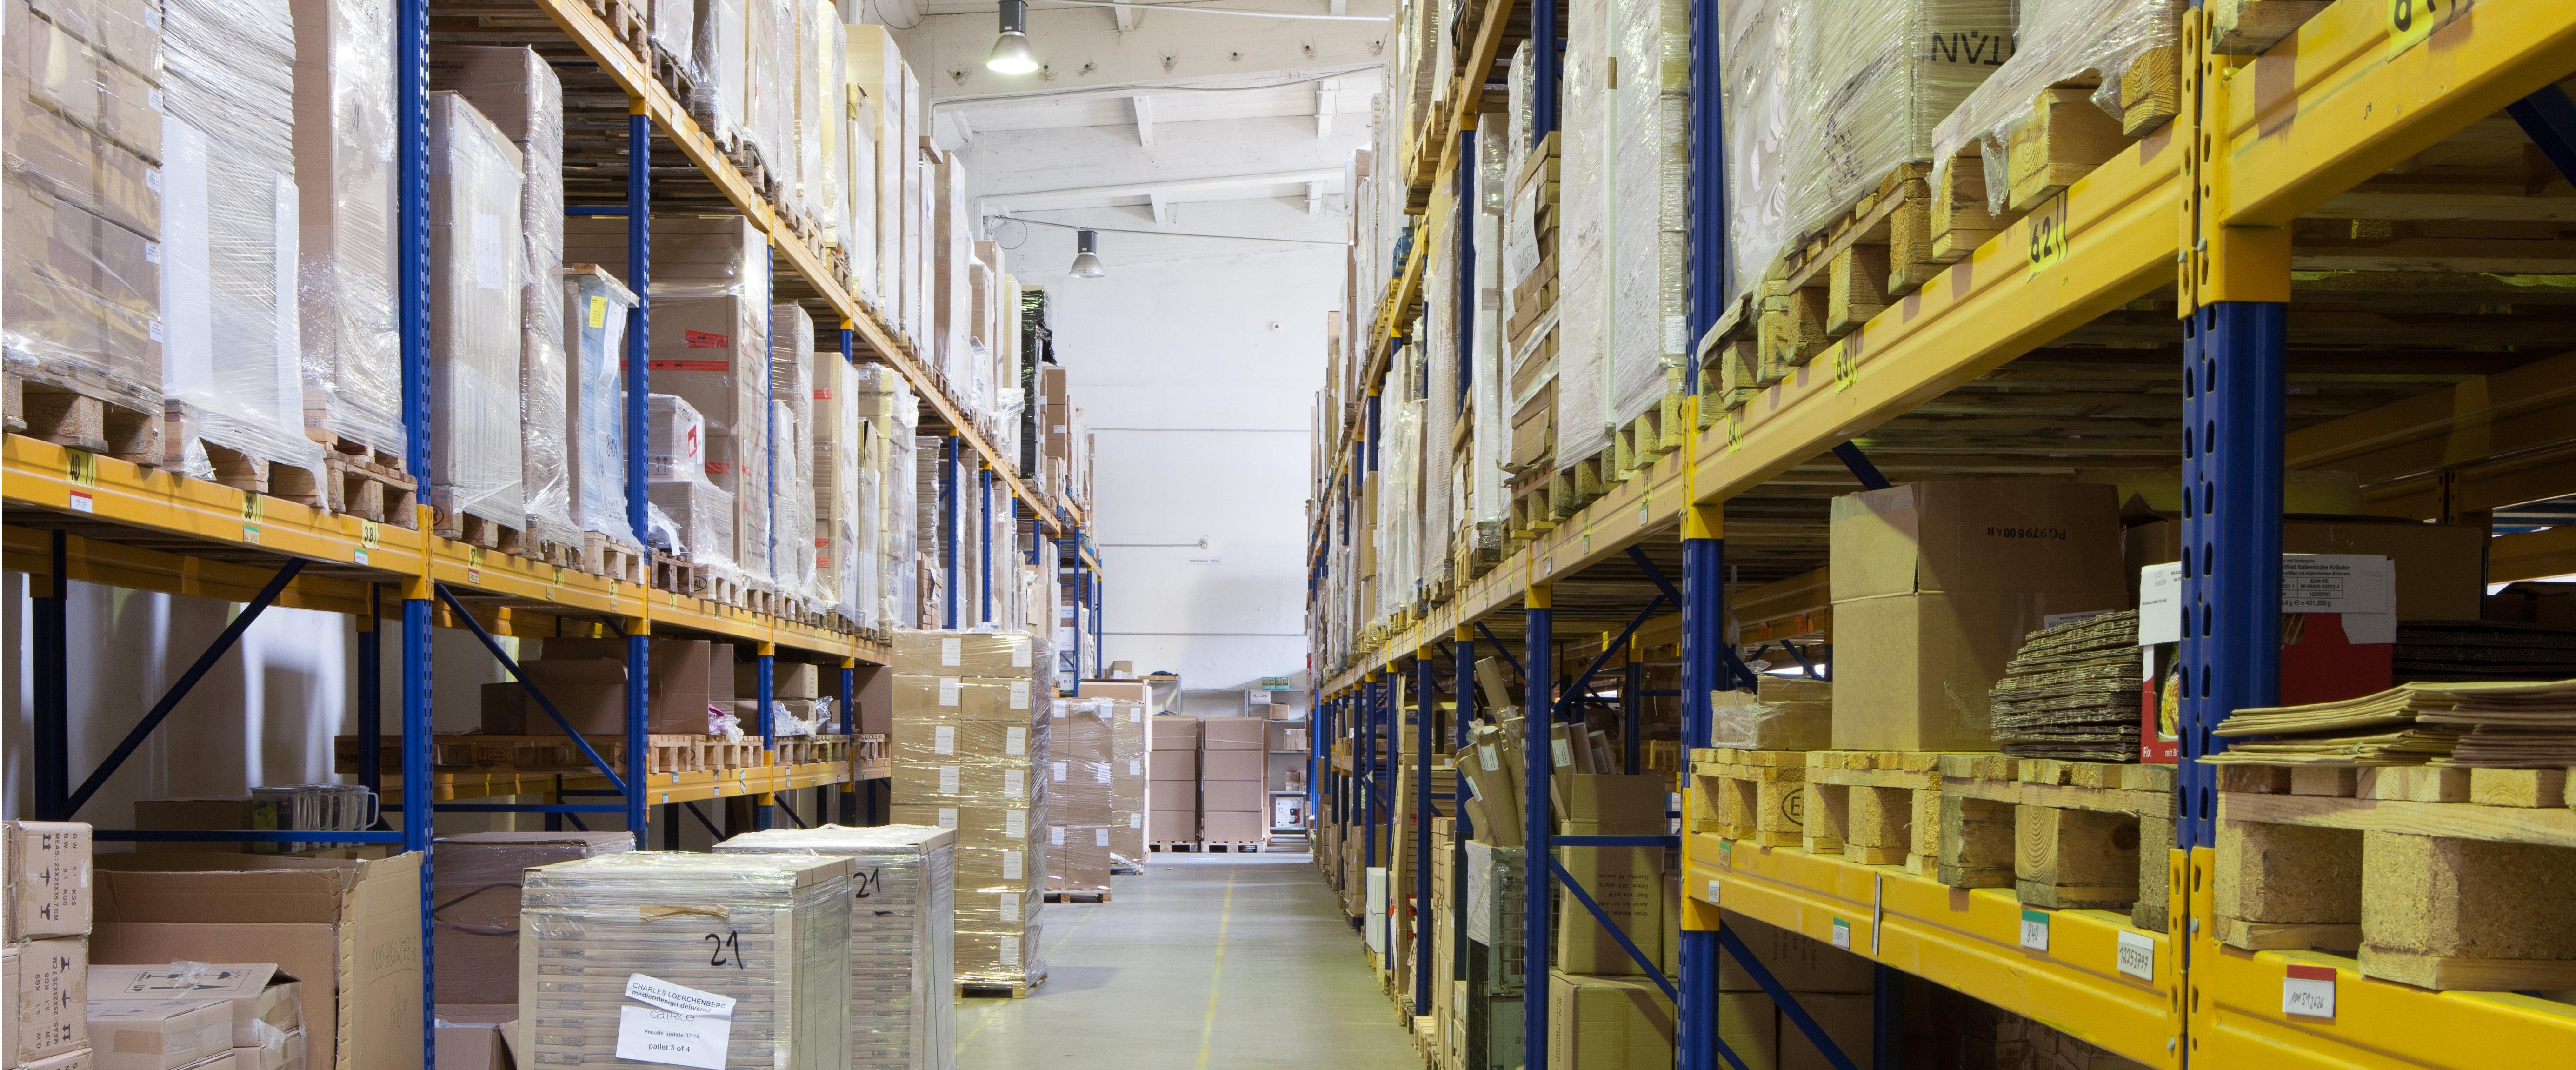 Lager & Logistik